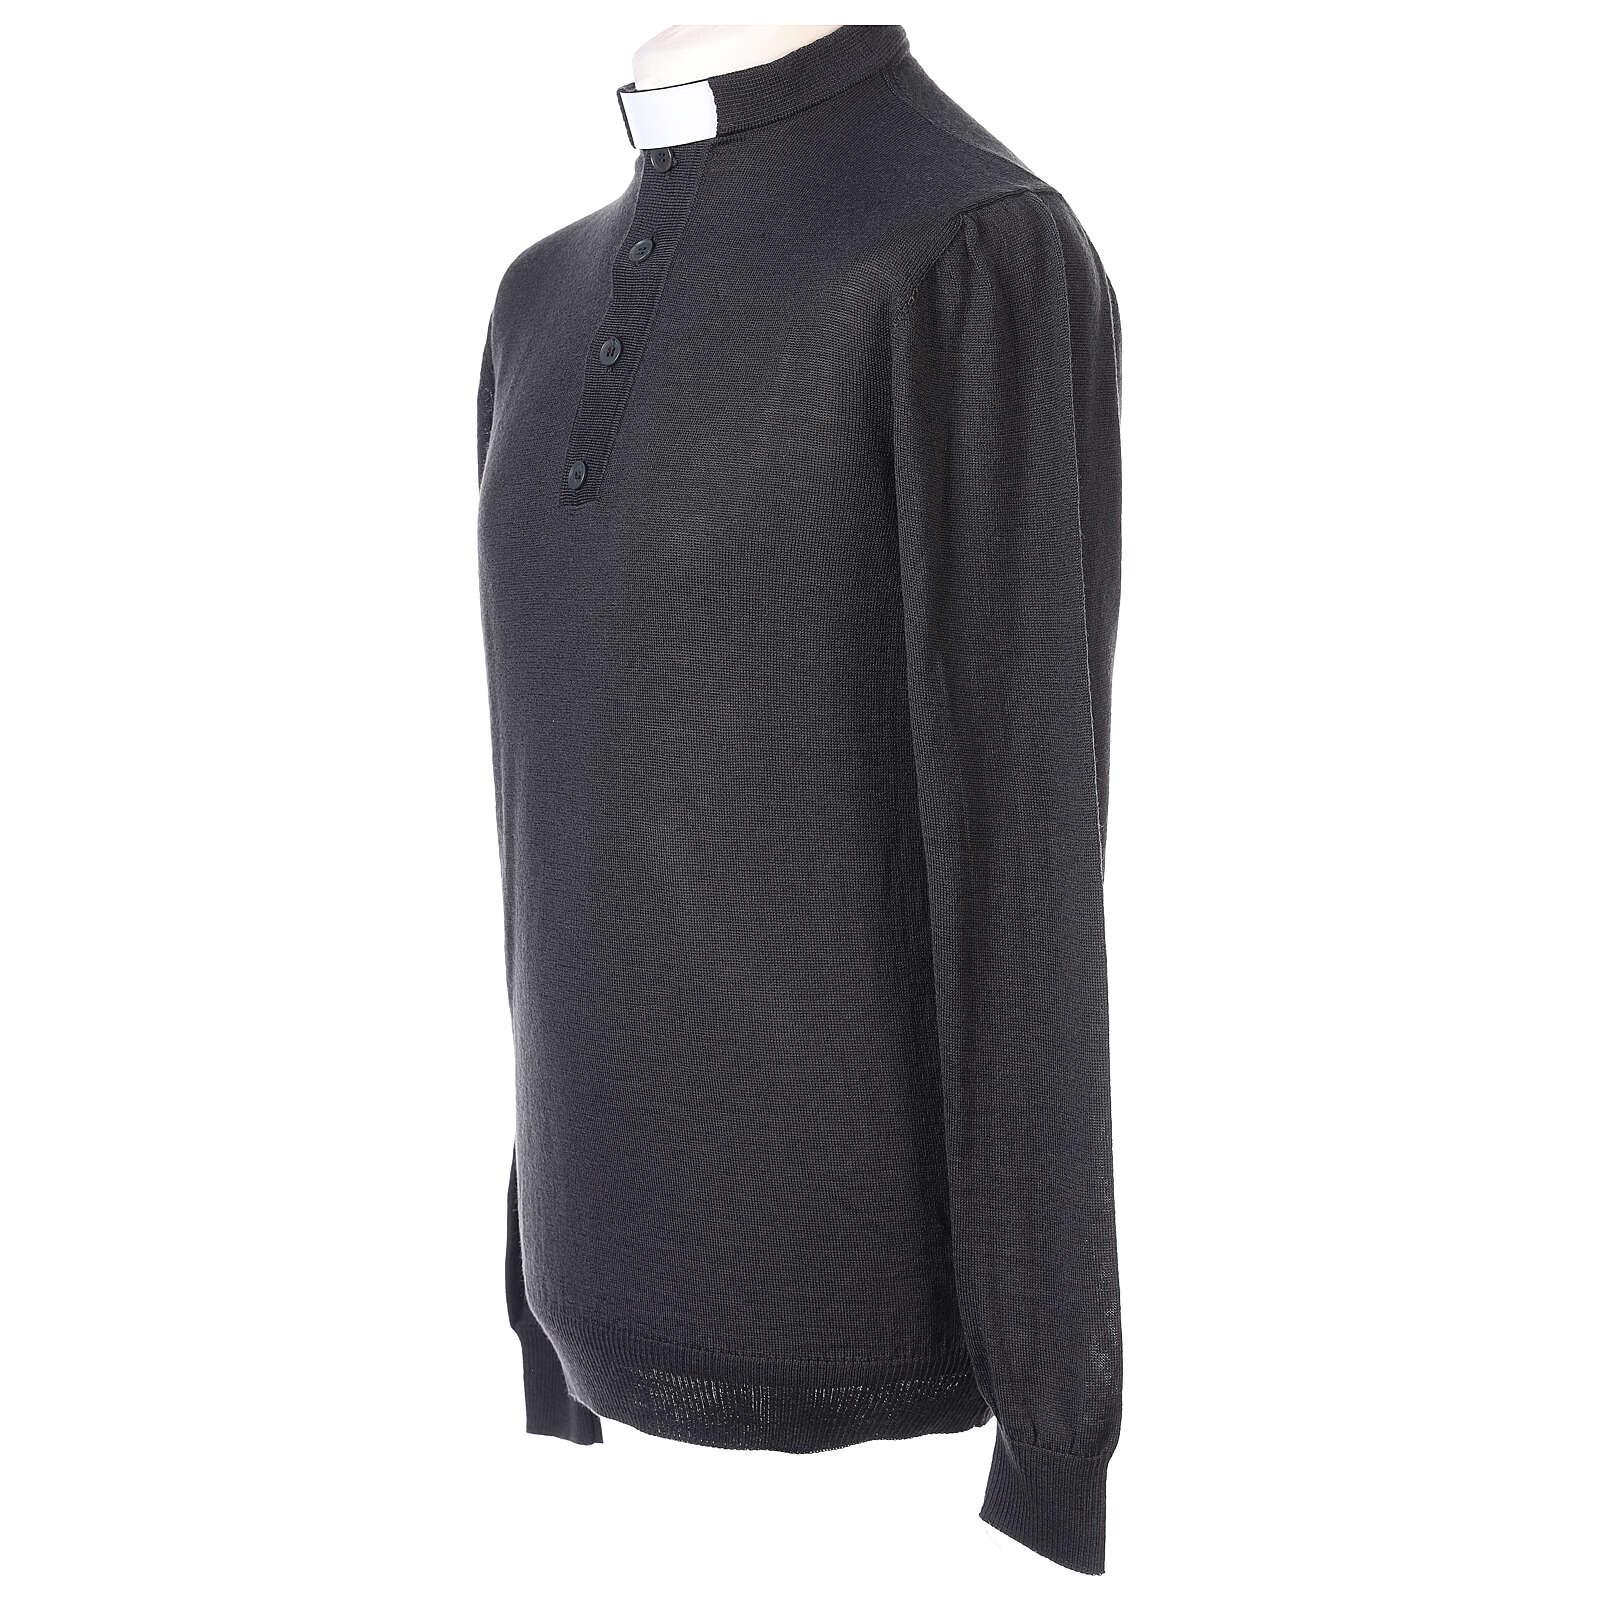 Camiseta Lana Merinos cuello clergy Gris oscuro 4